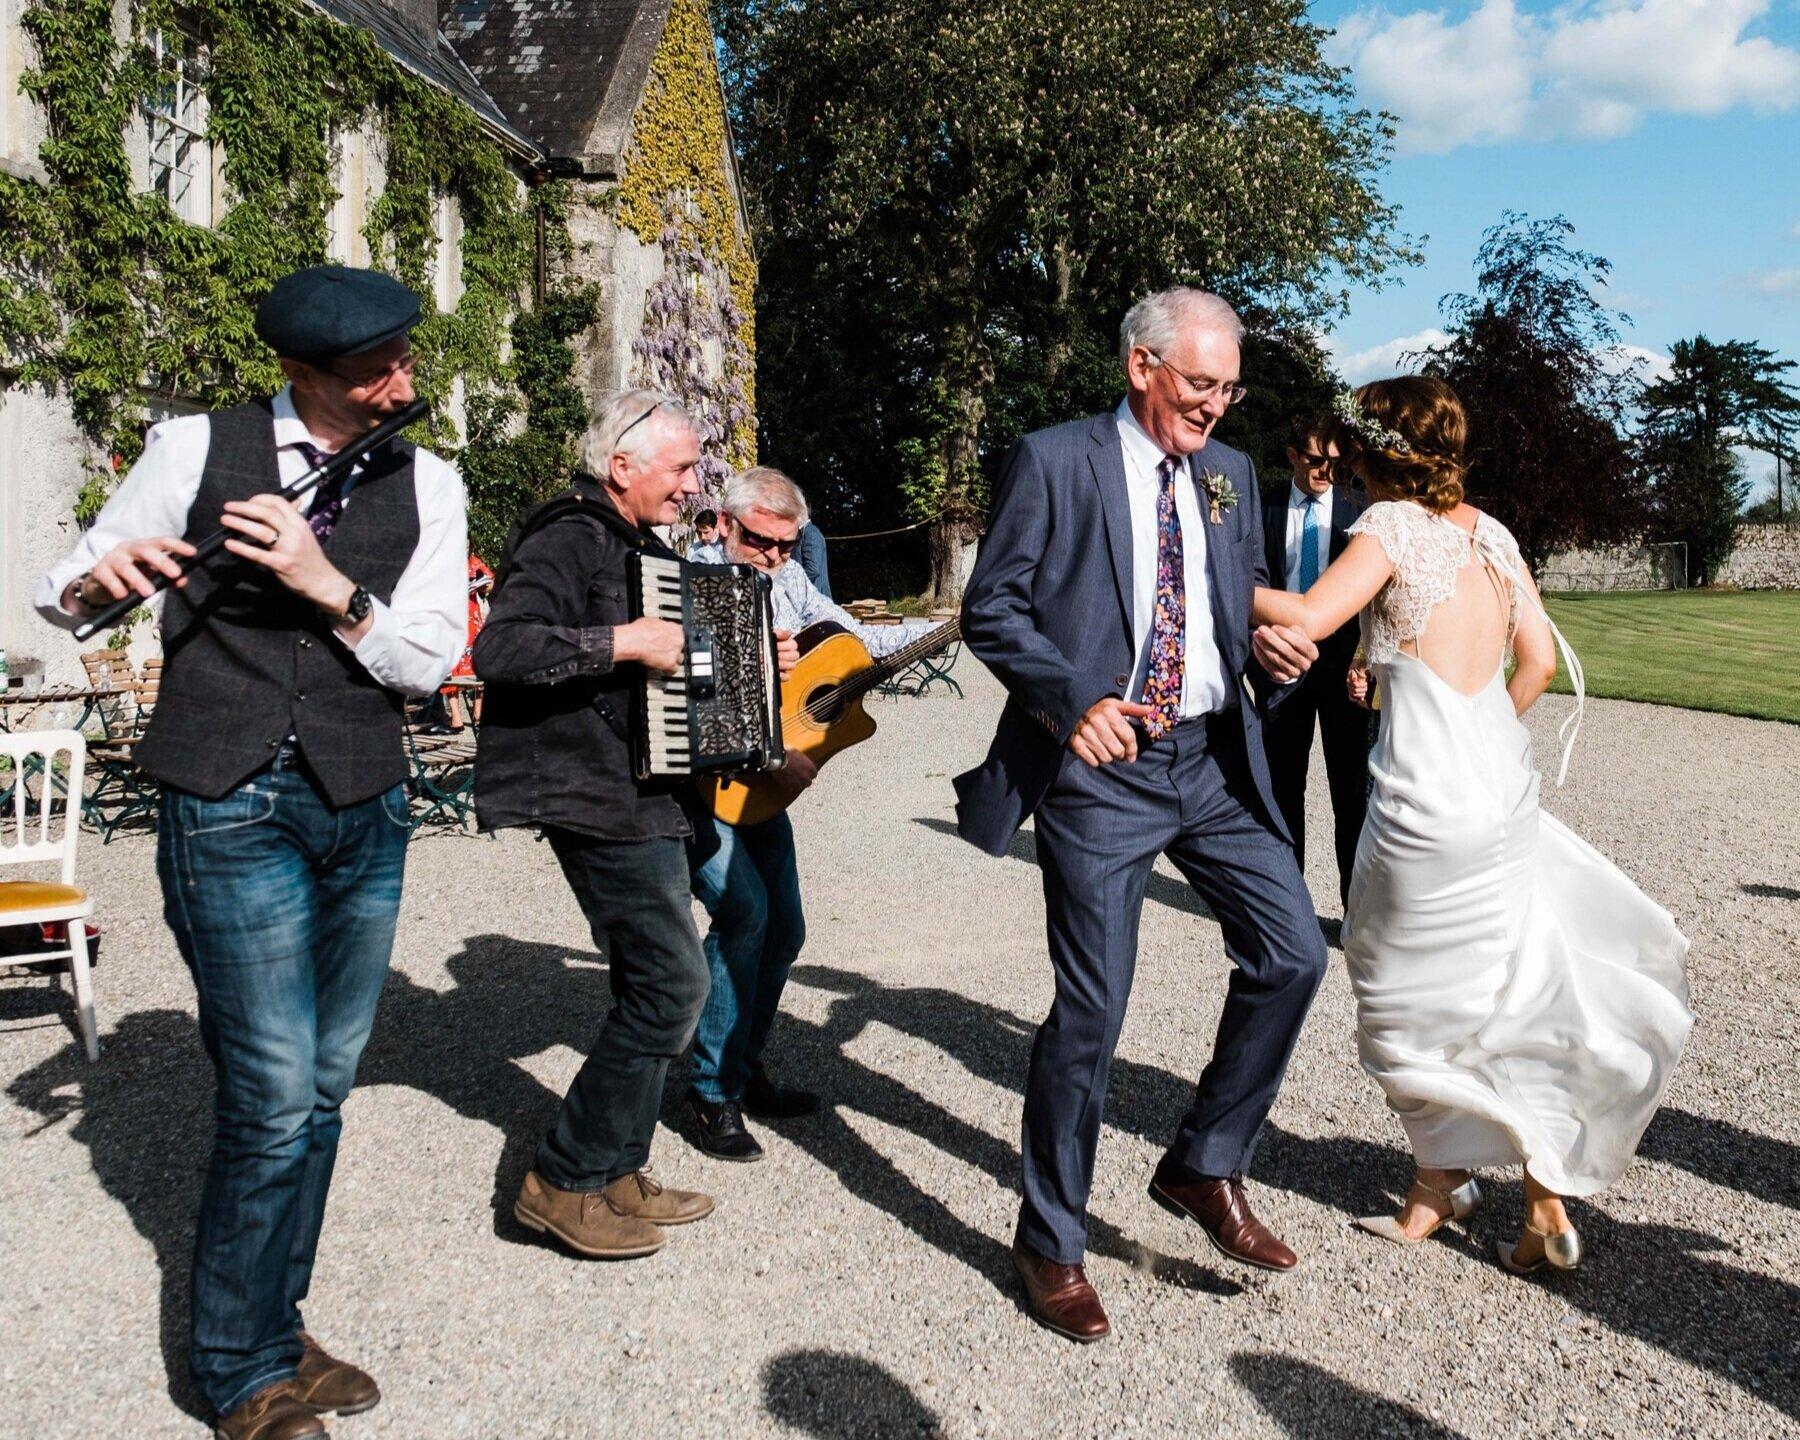 Cloughjordan House - Irish Wedding Traditions